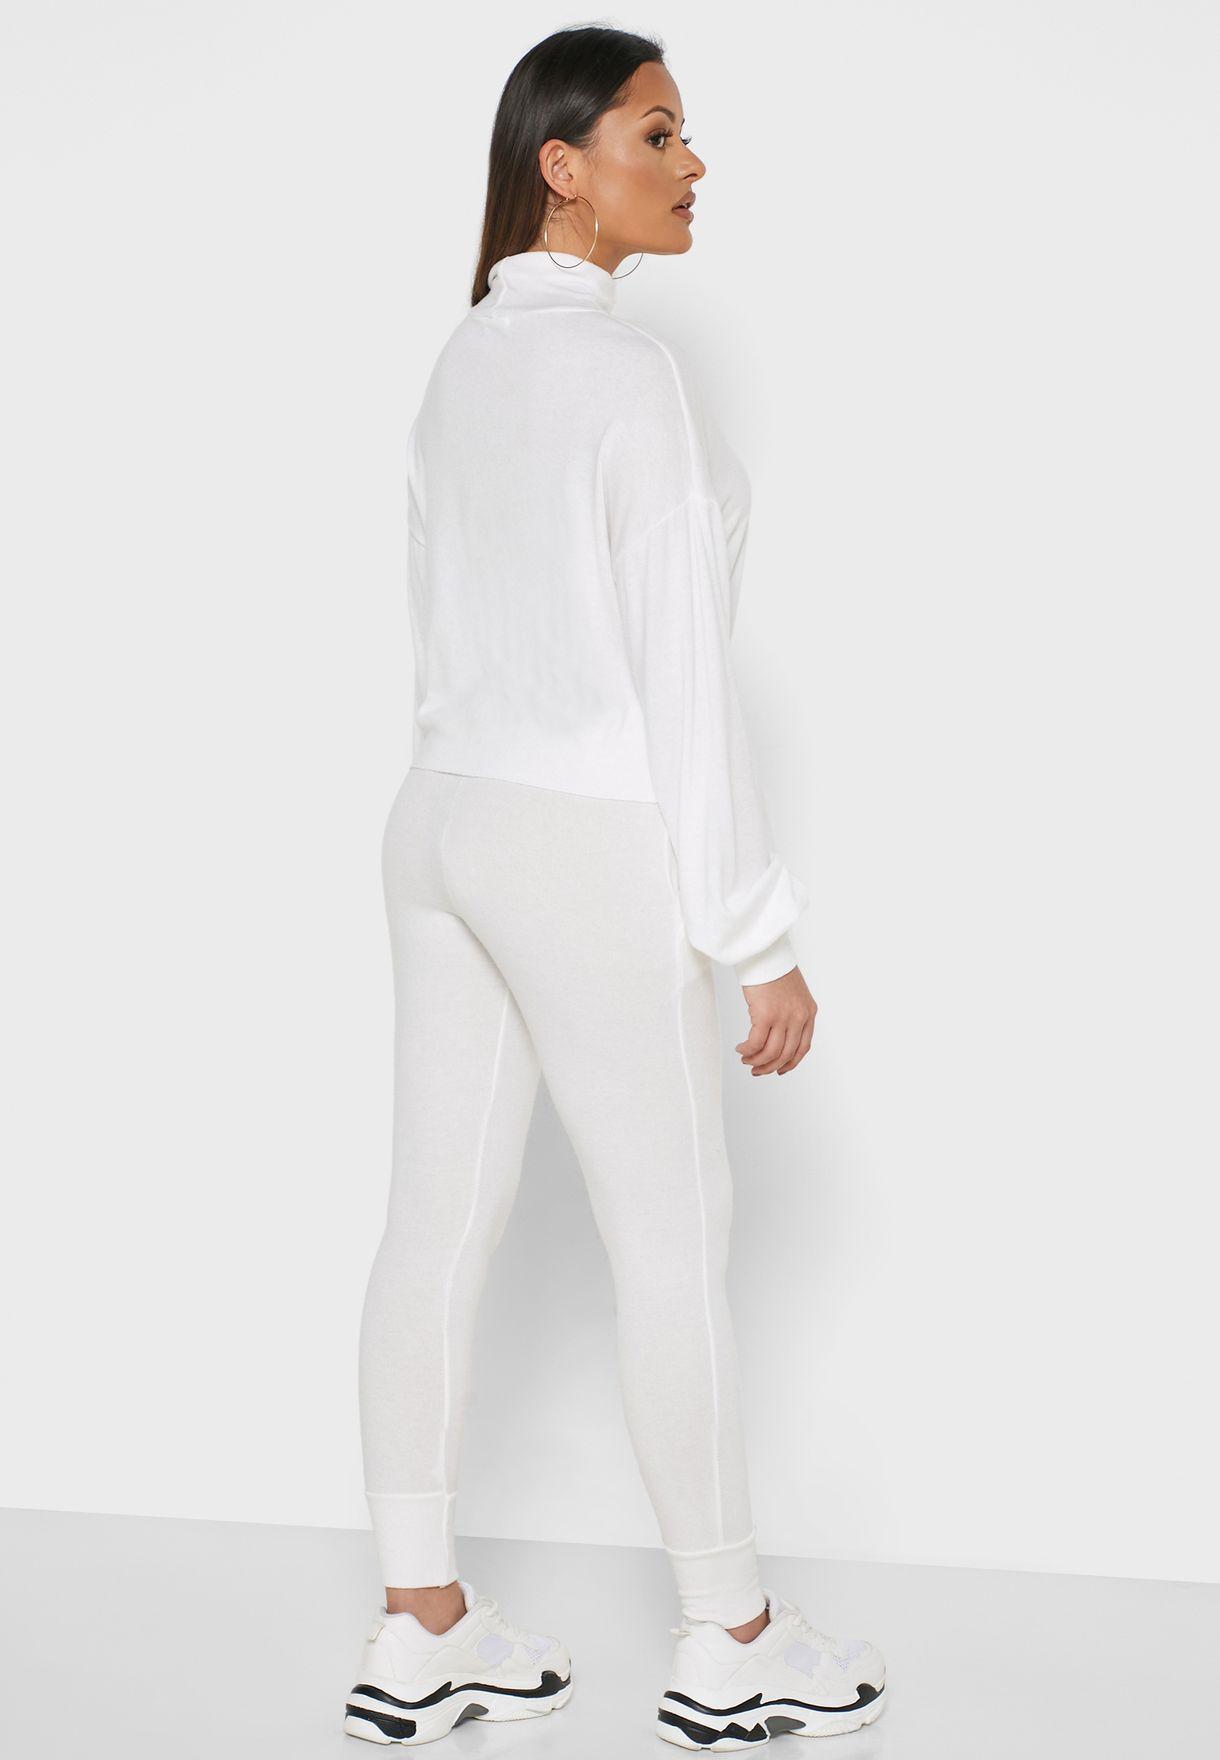 HIgh Neck Sweater Pants Set